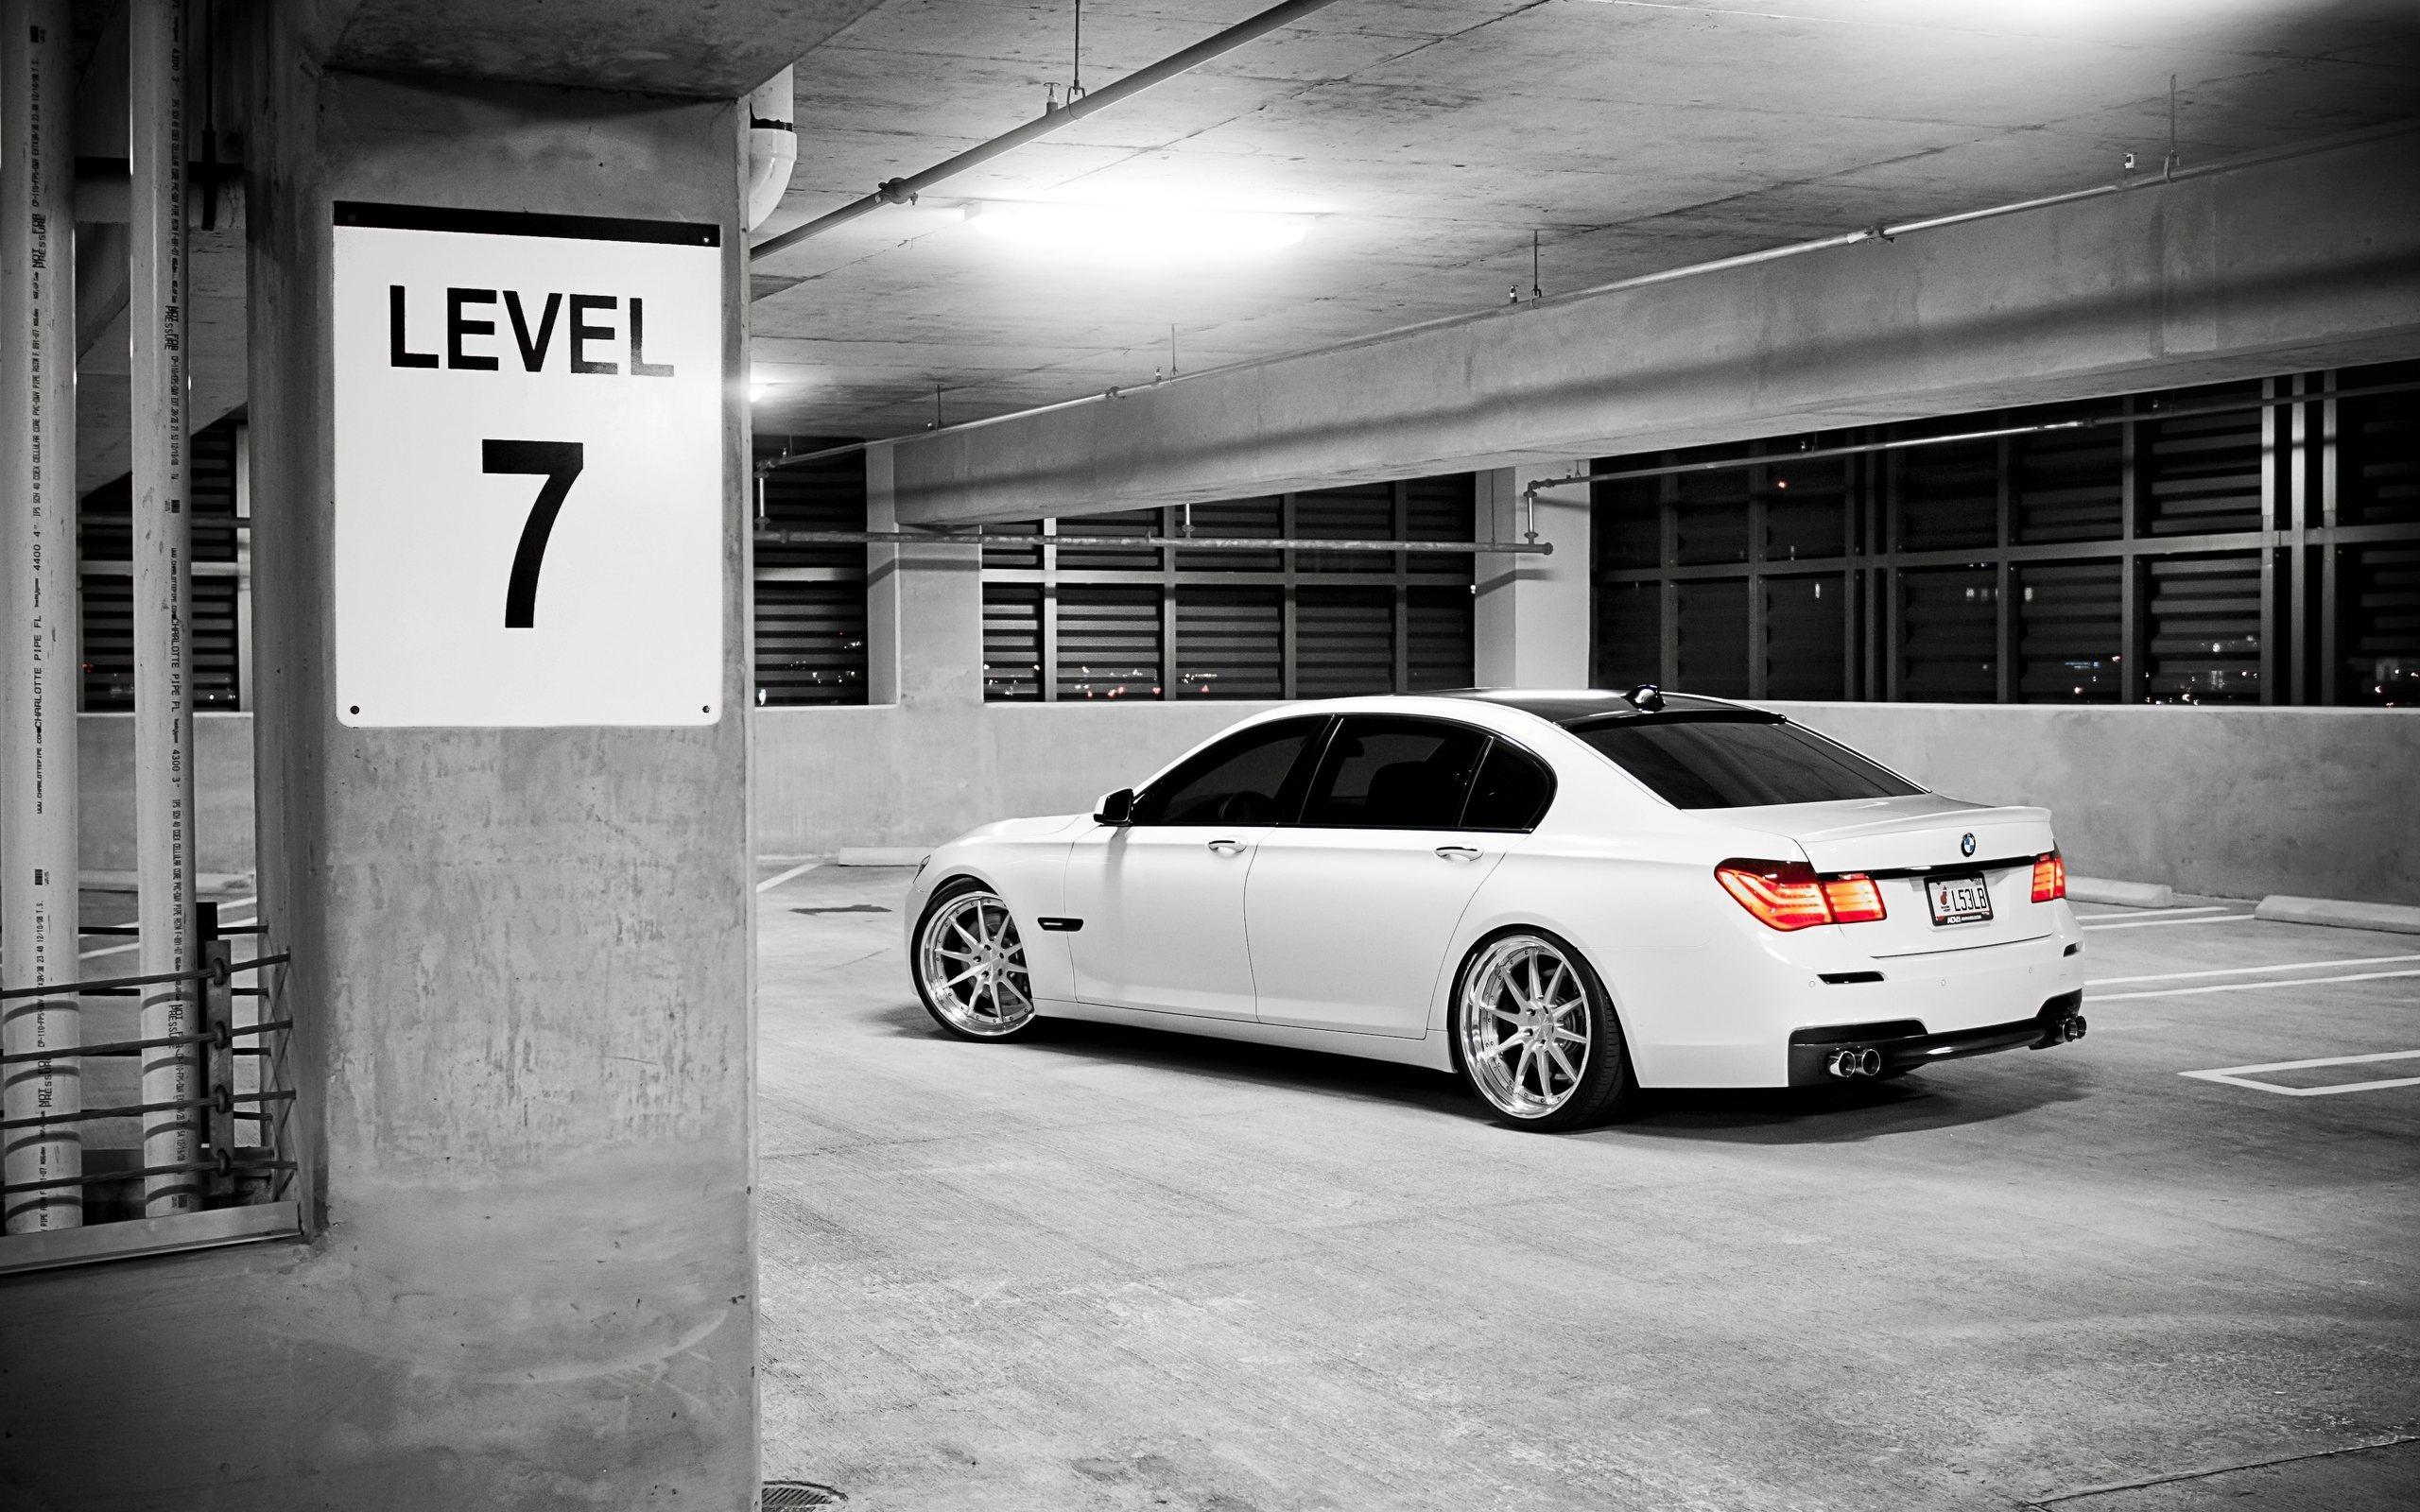 Bmw, cars, city, Auto, white, cтоянка, parking, остановка, 7series